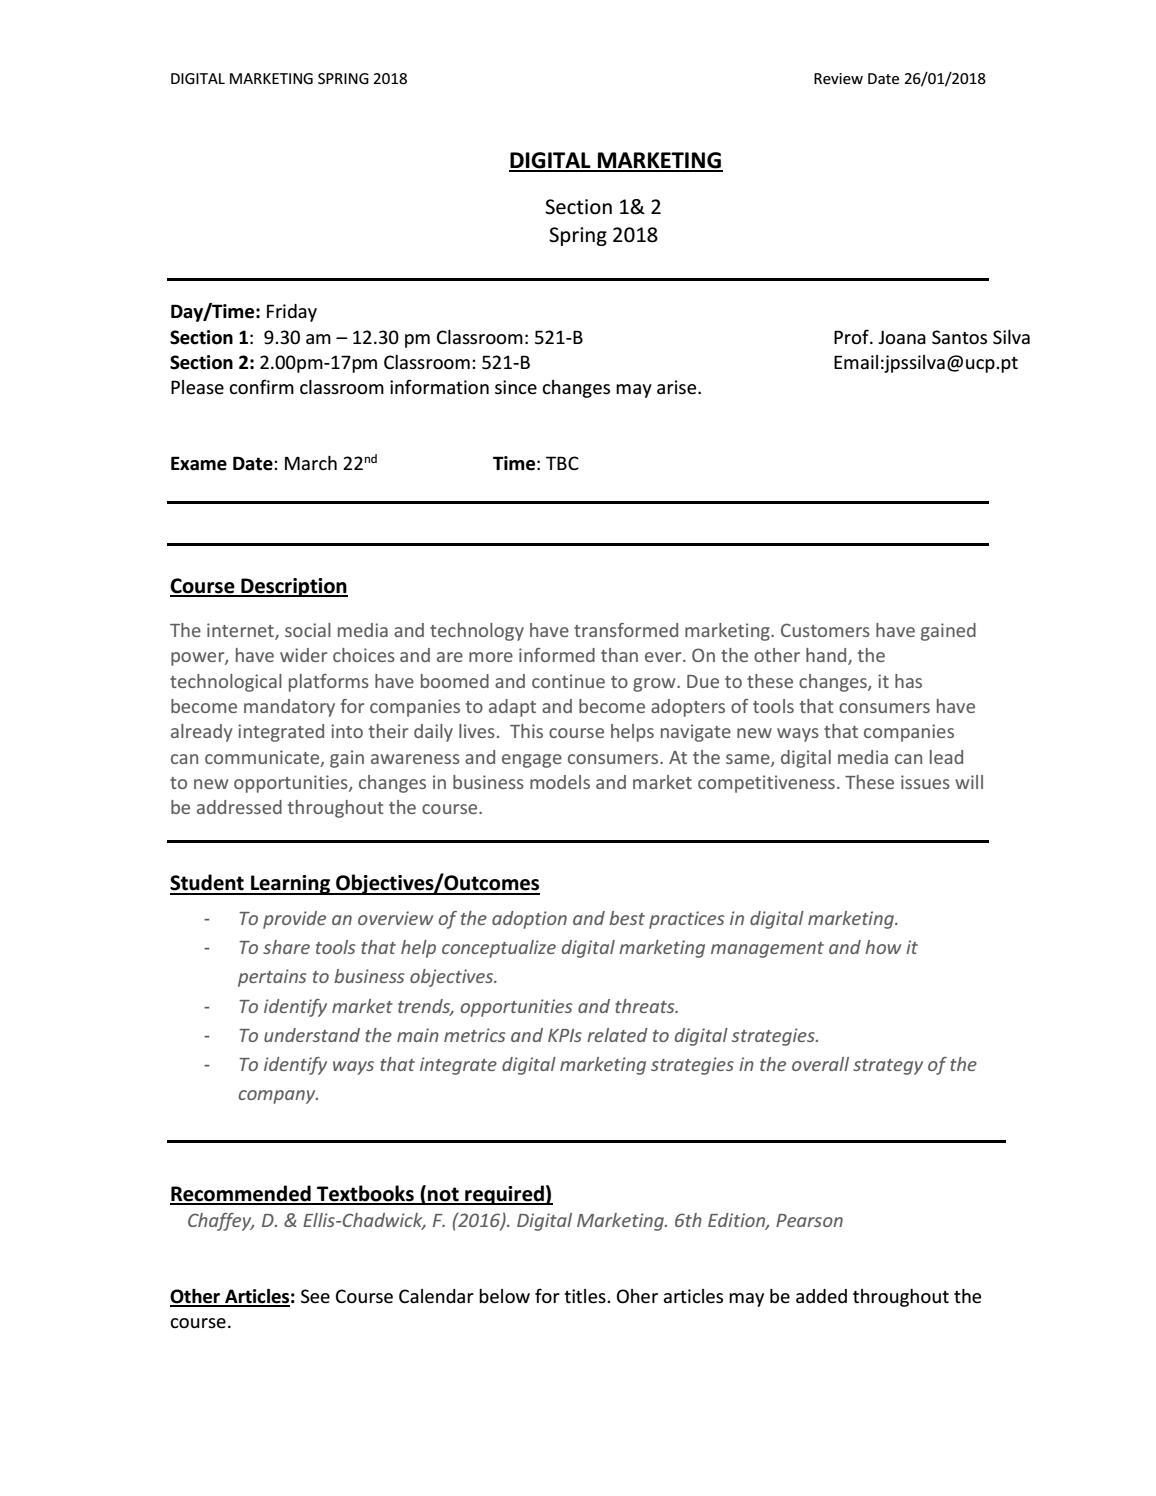 university essay structure plan template